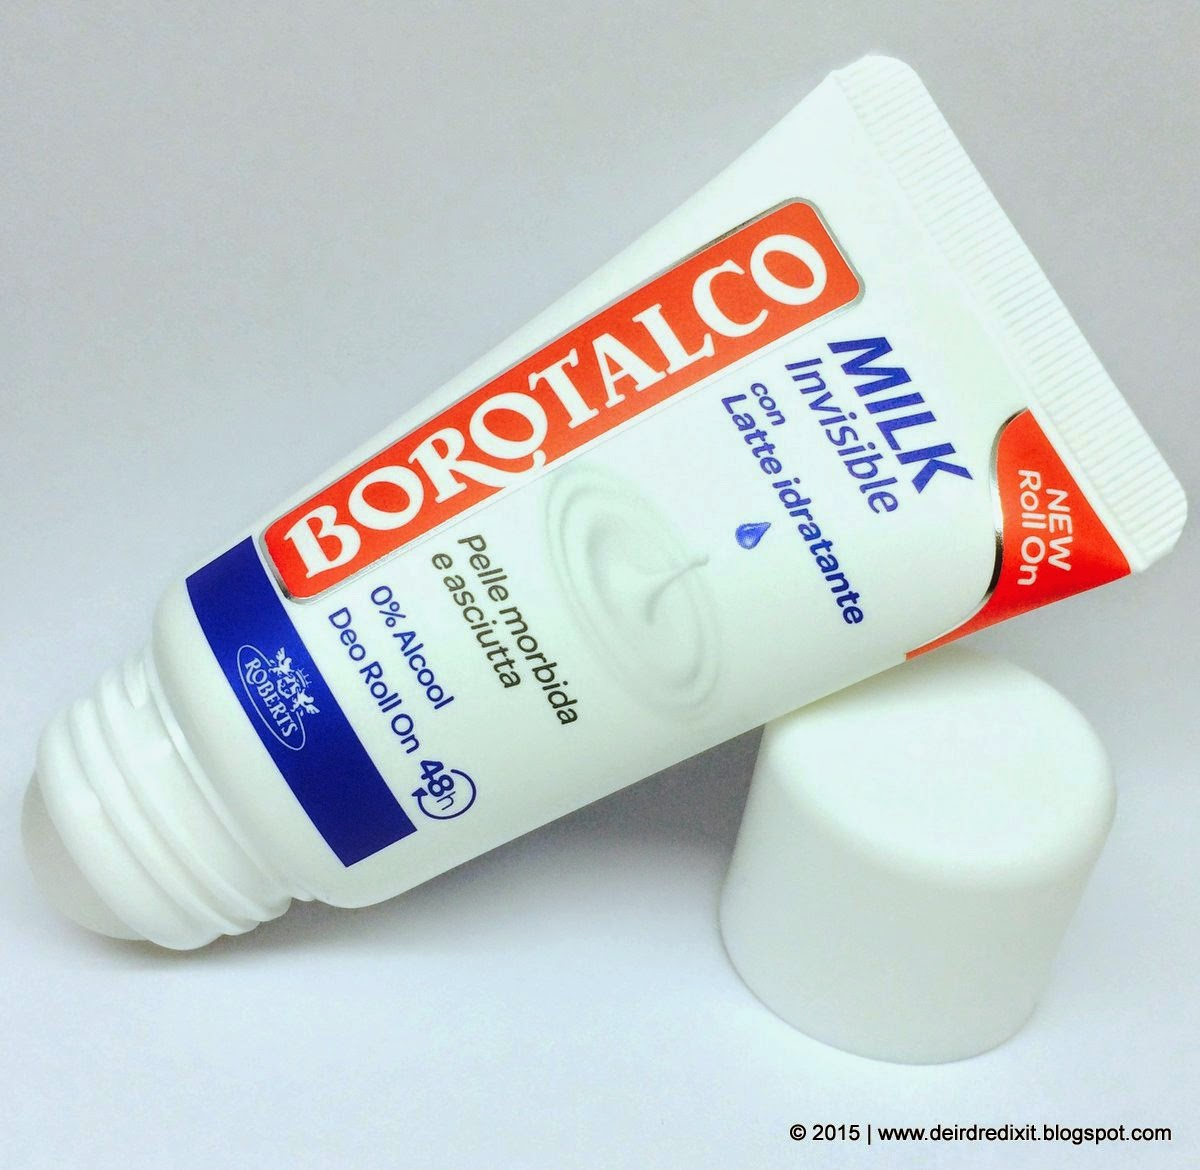 Borotalco Deodorante Milk Tubo Roll On